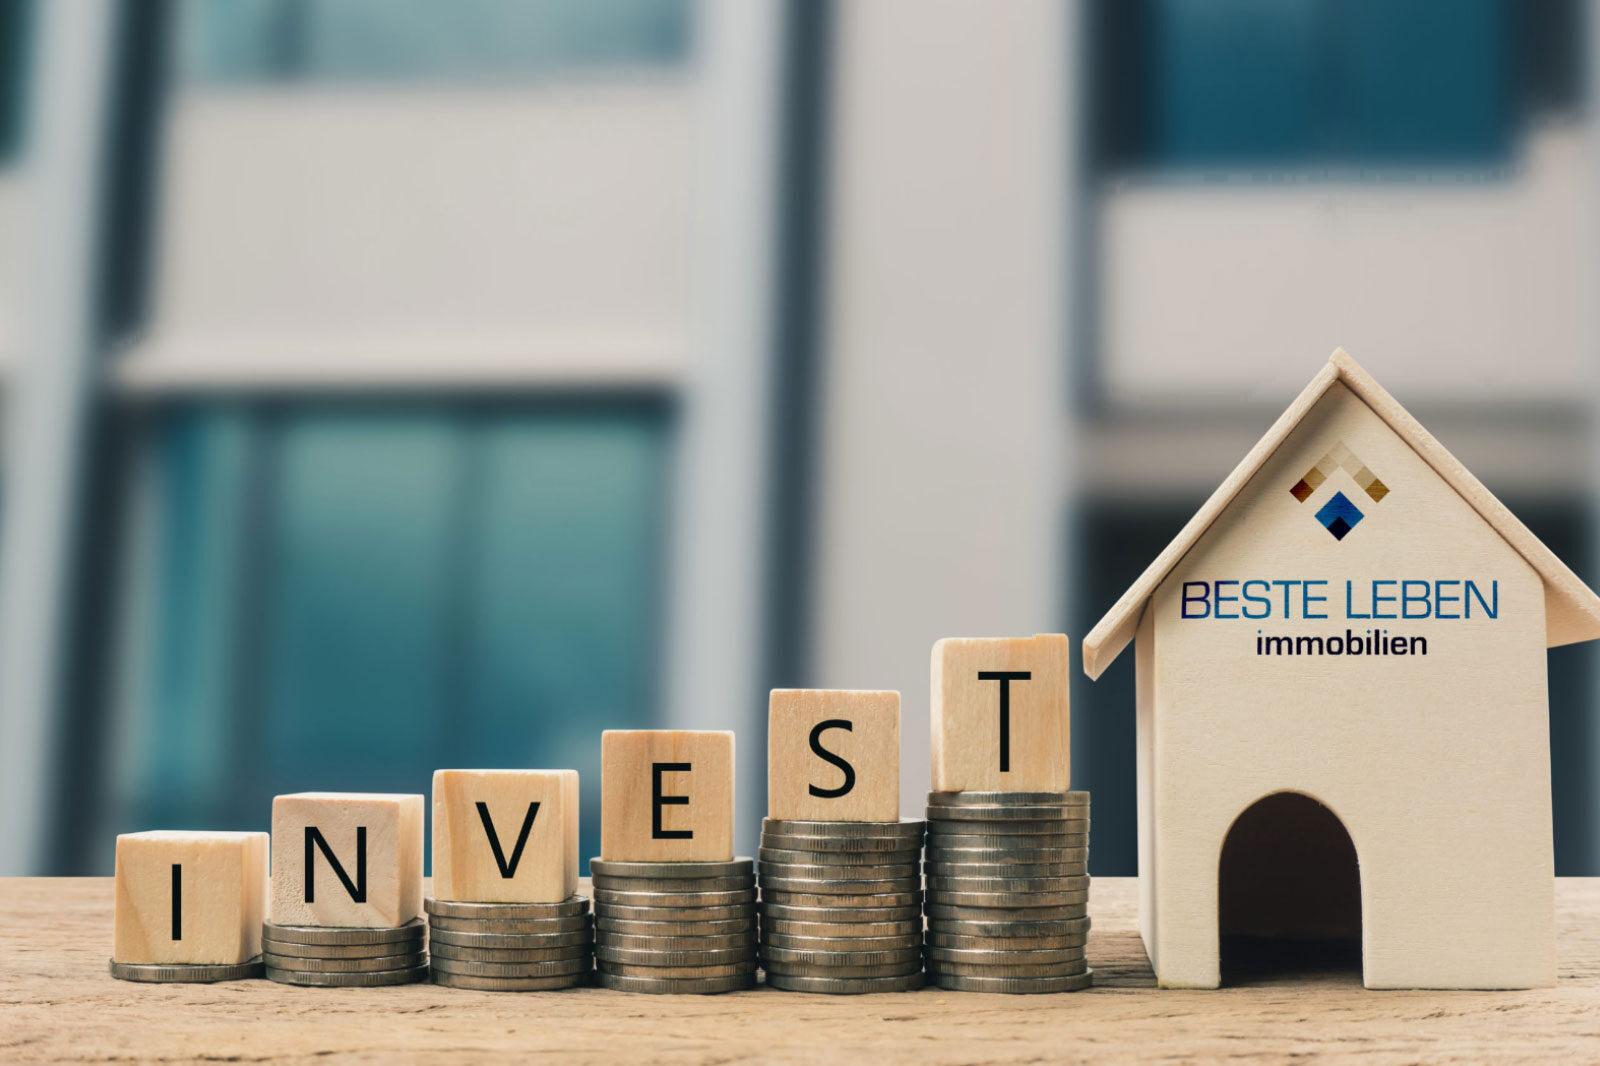 Beste Leben Immobilien GmbH - Investment